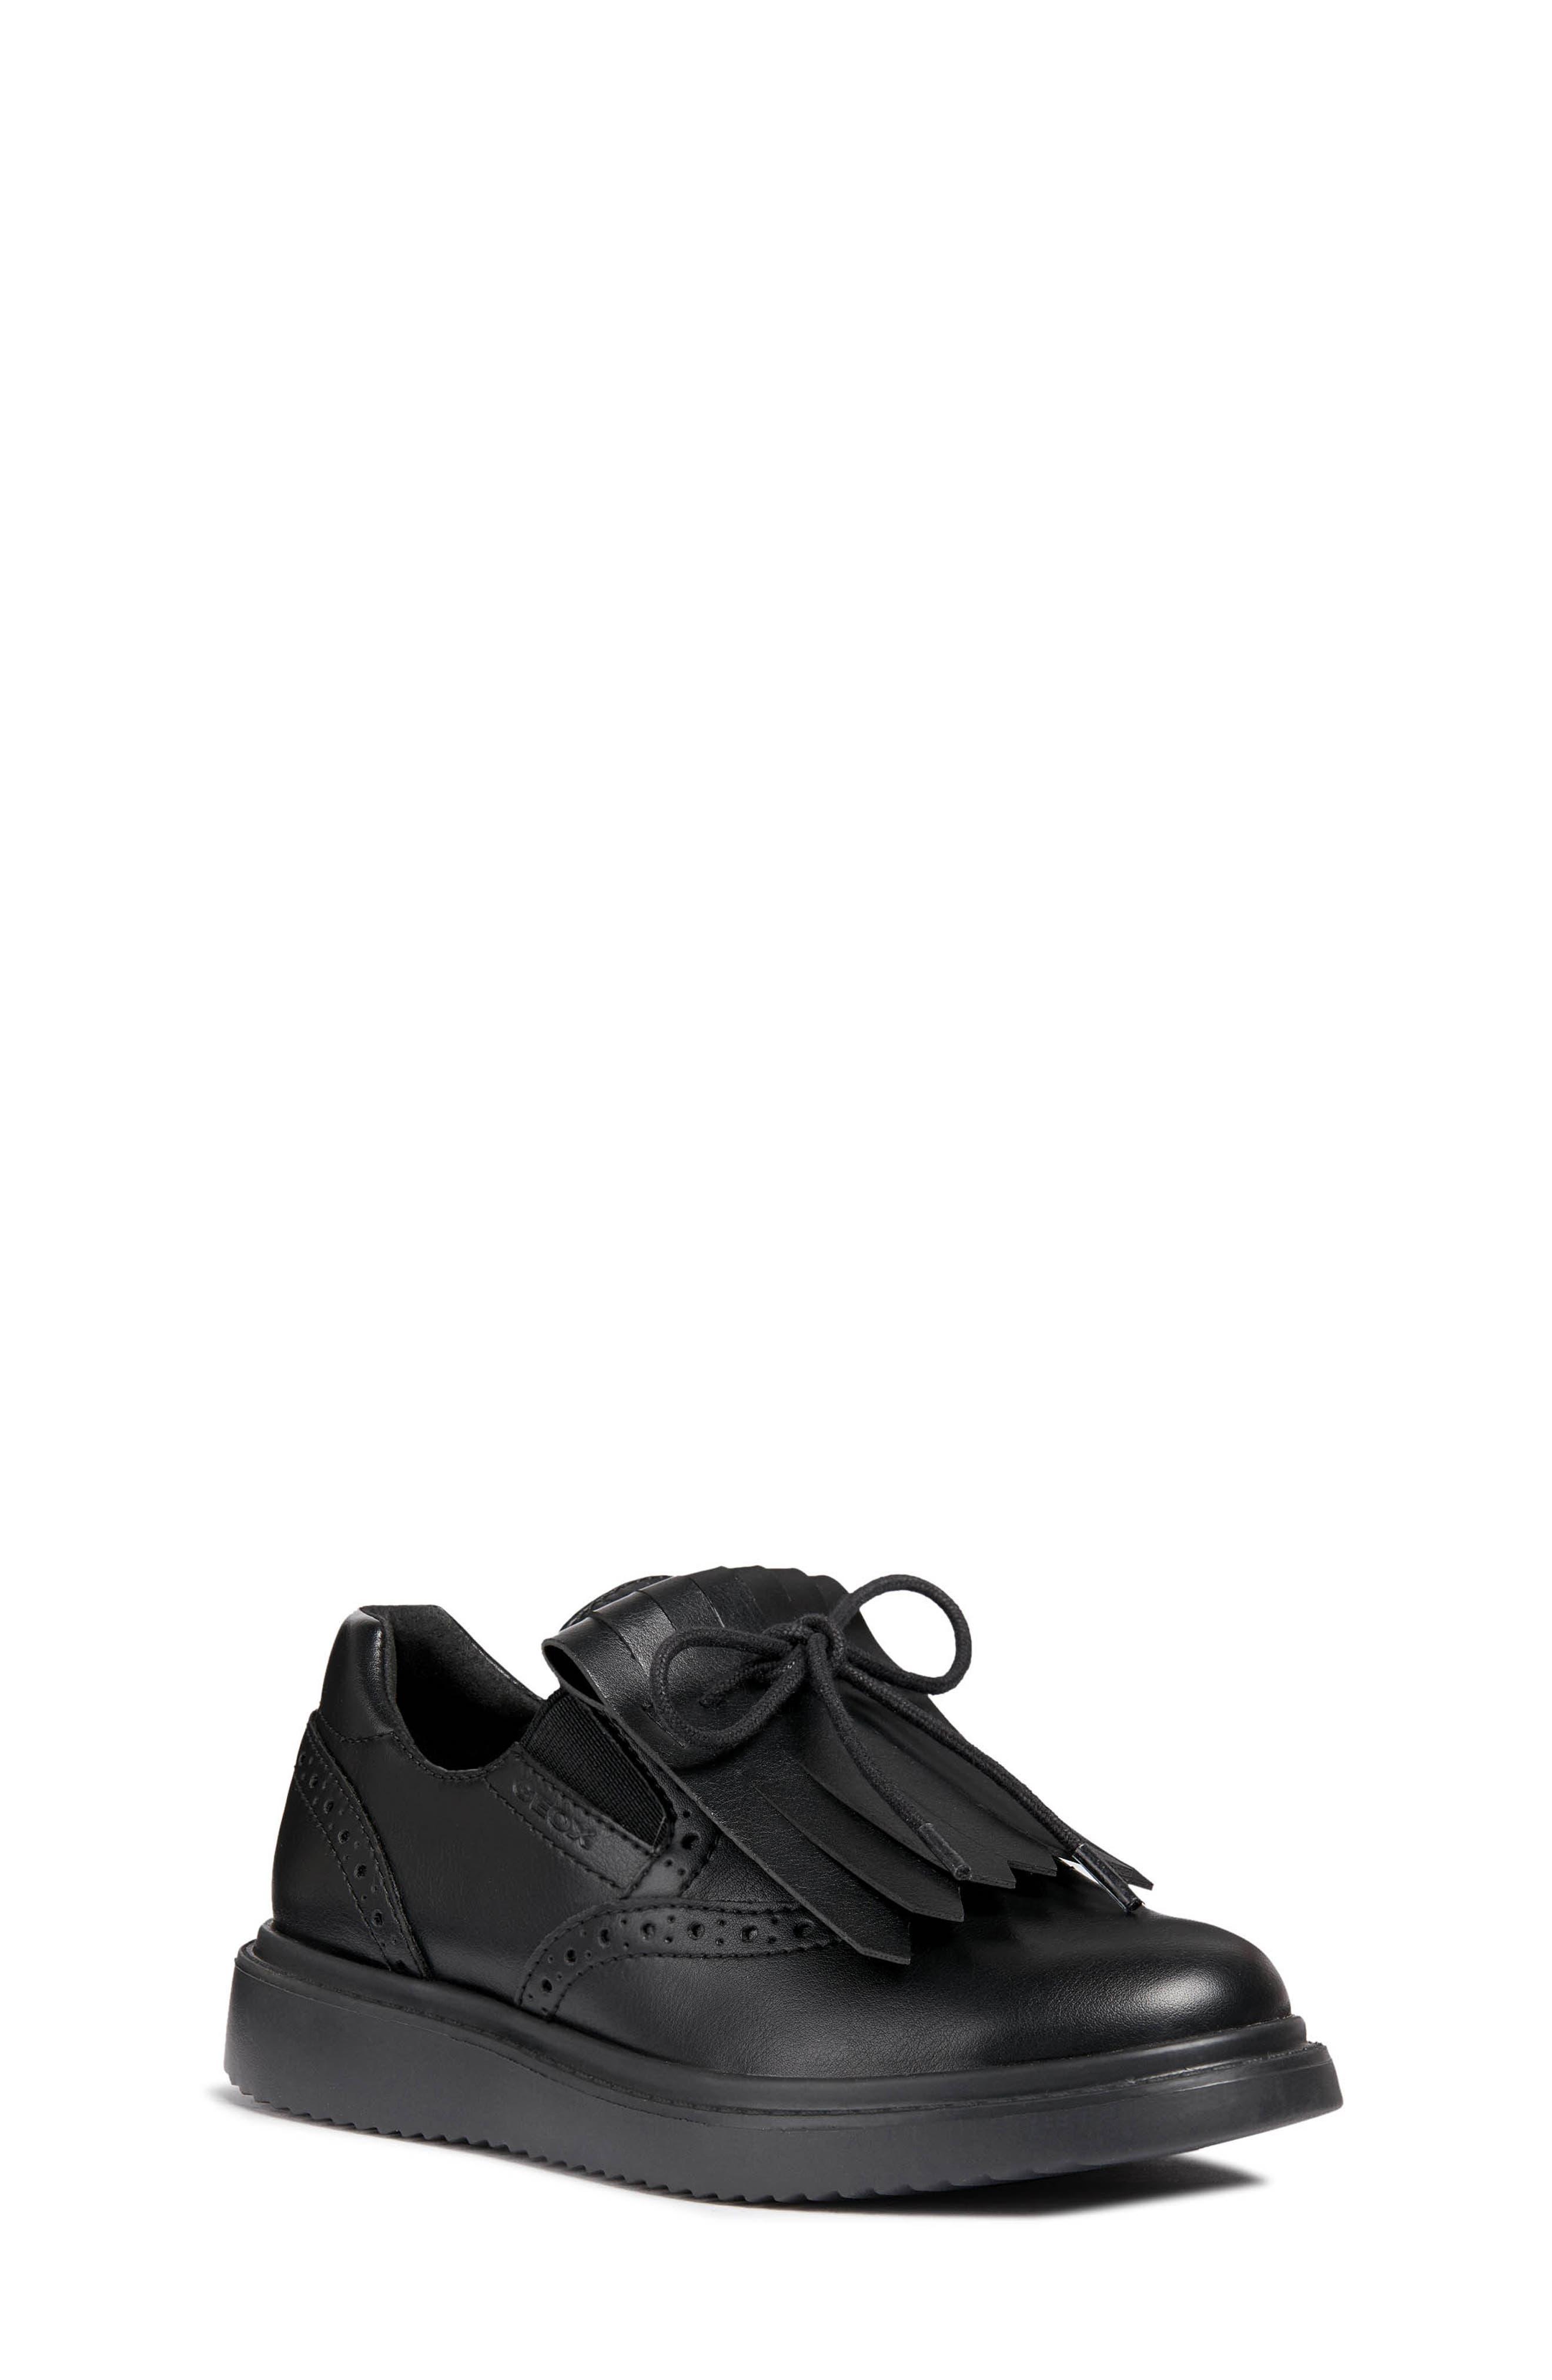 Thymar Kiltie Fringe Sneaker,                             Main thumbnail 1, color,                             BLACK